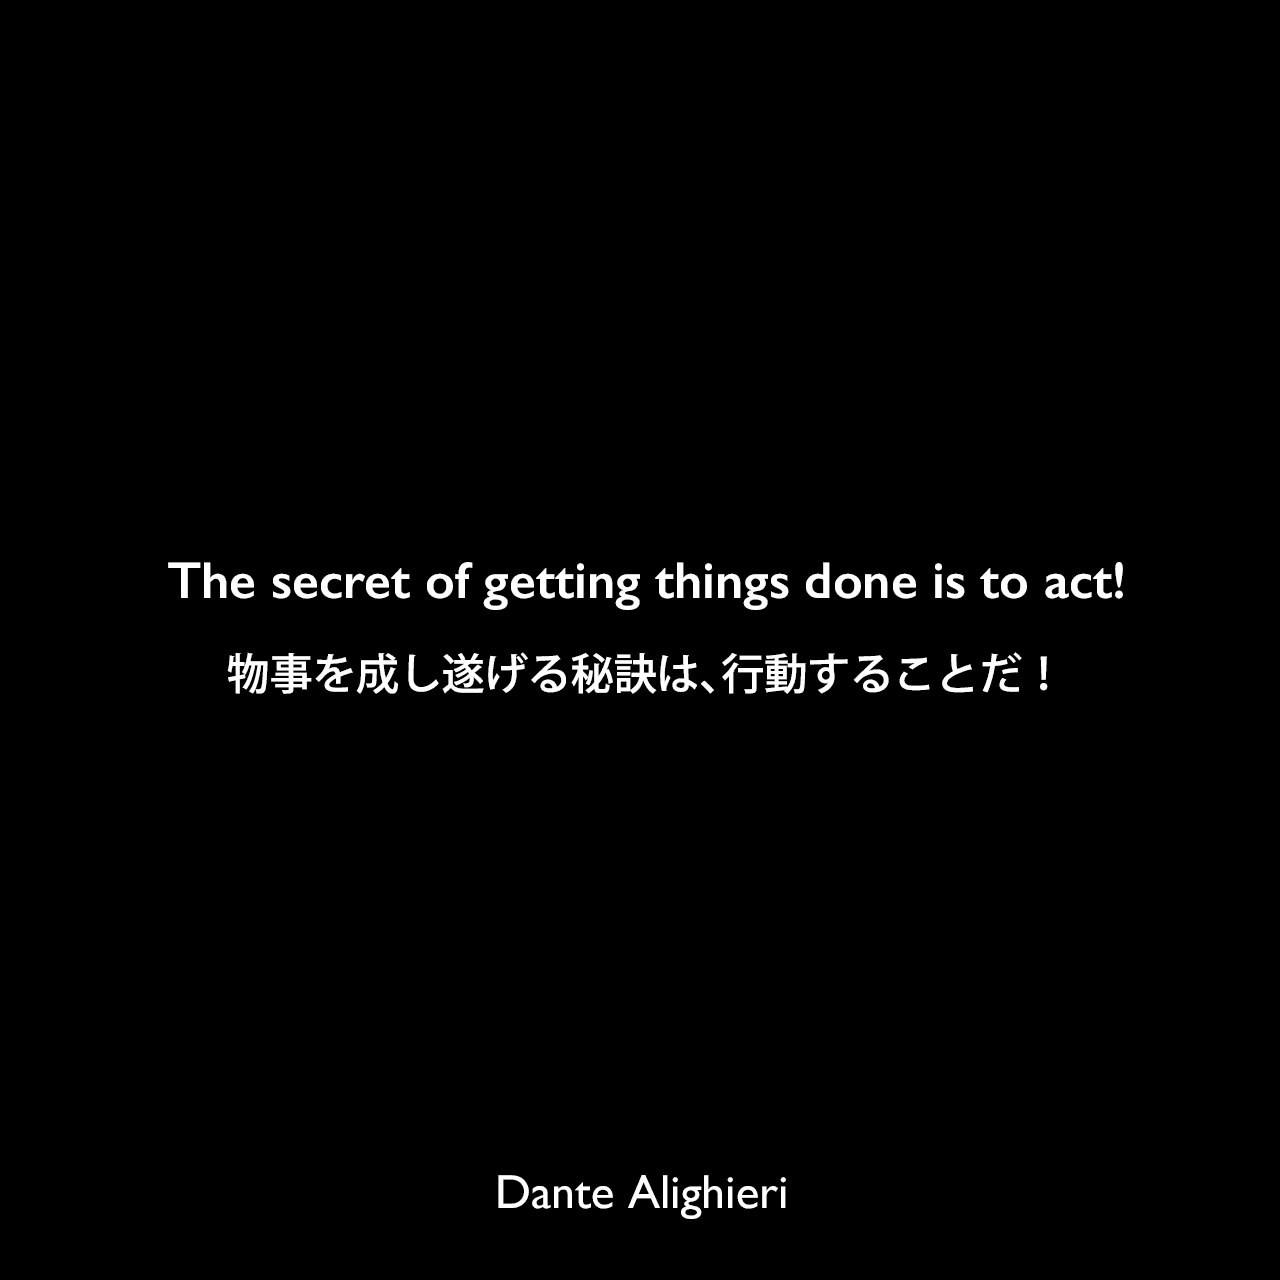 The secret of getting things done is to act!物事を成し遂げる秘訣は、行動することだ!Dante Alighieri